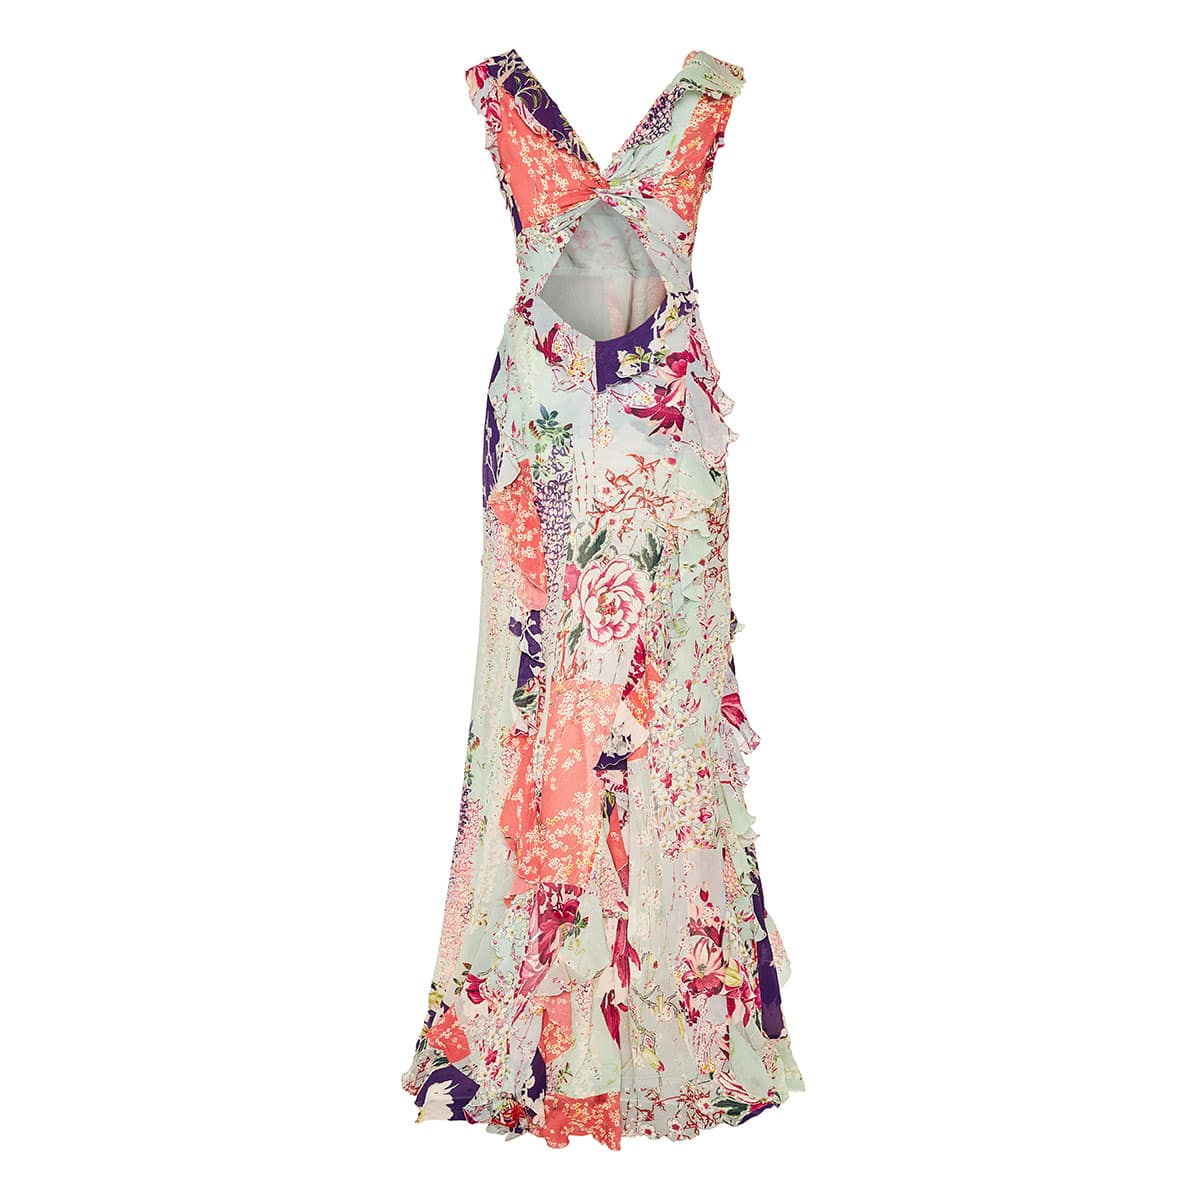 Patchwork print long ruffled dress